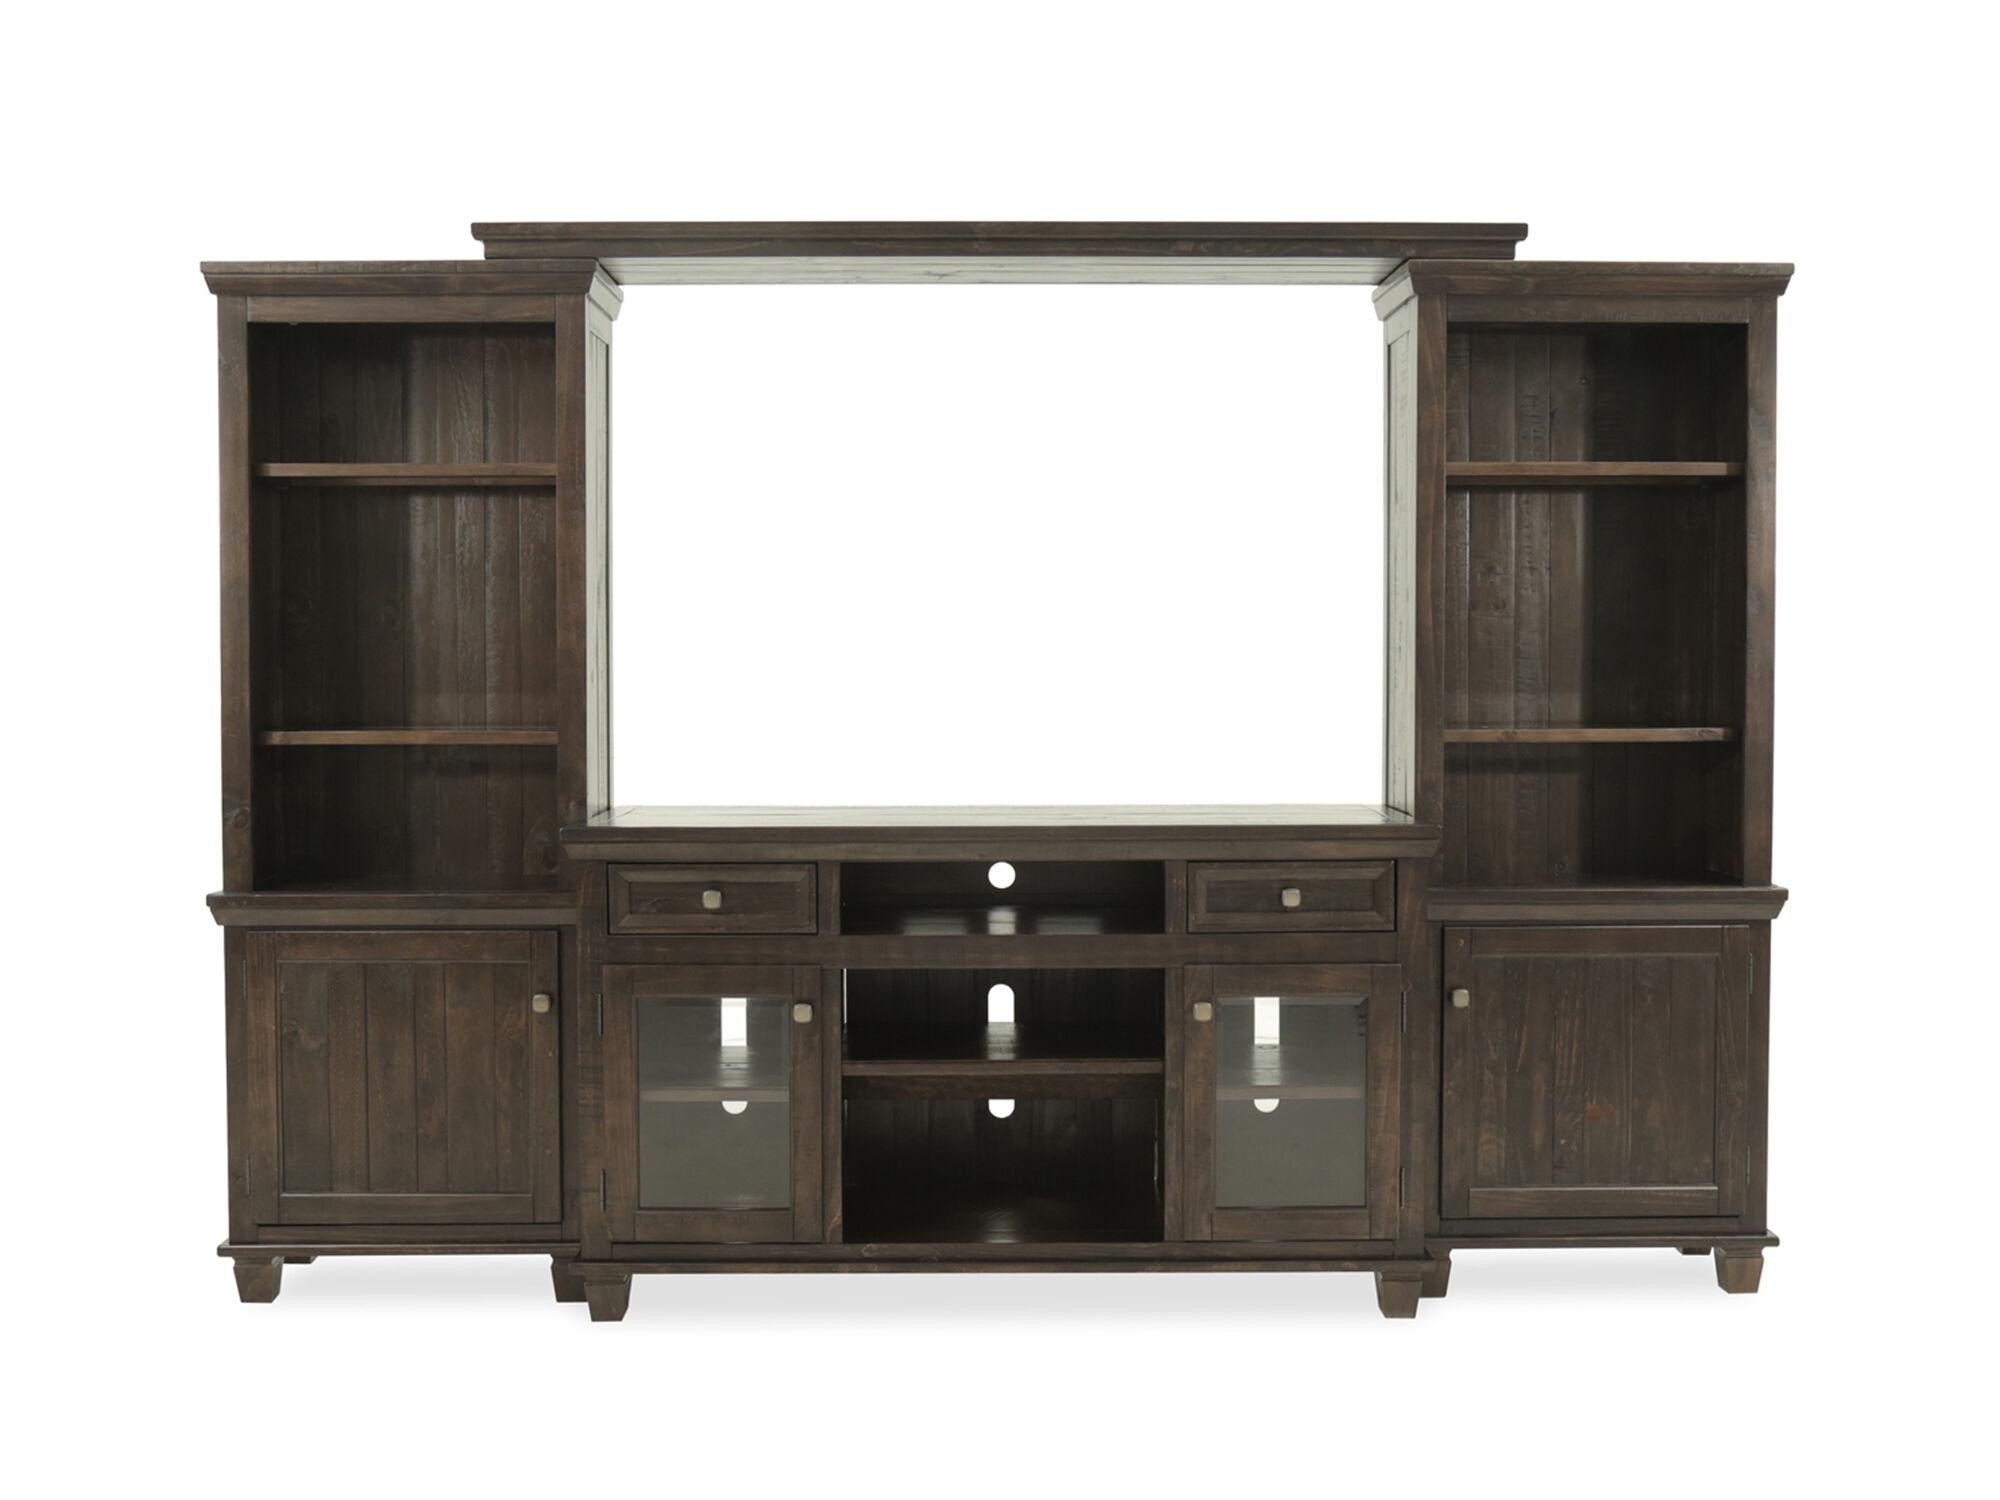 Four Piece Solid Wood Entertainment Center In Dark Brown